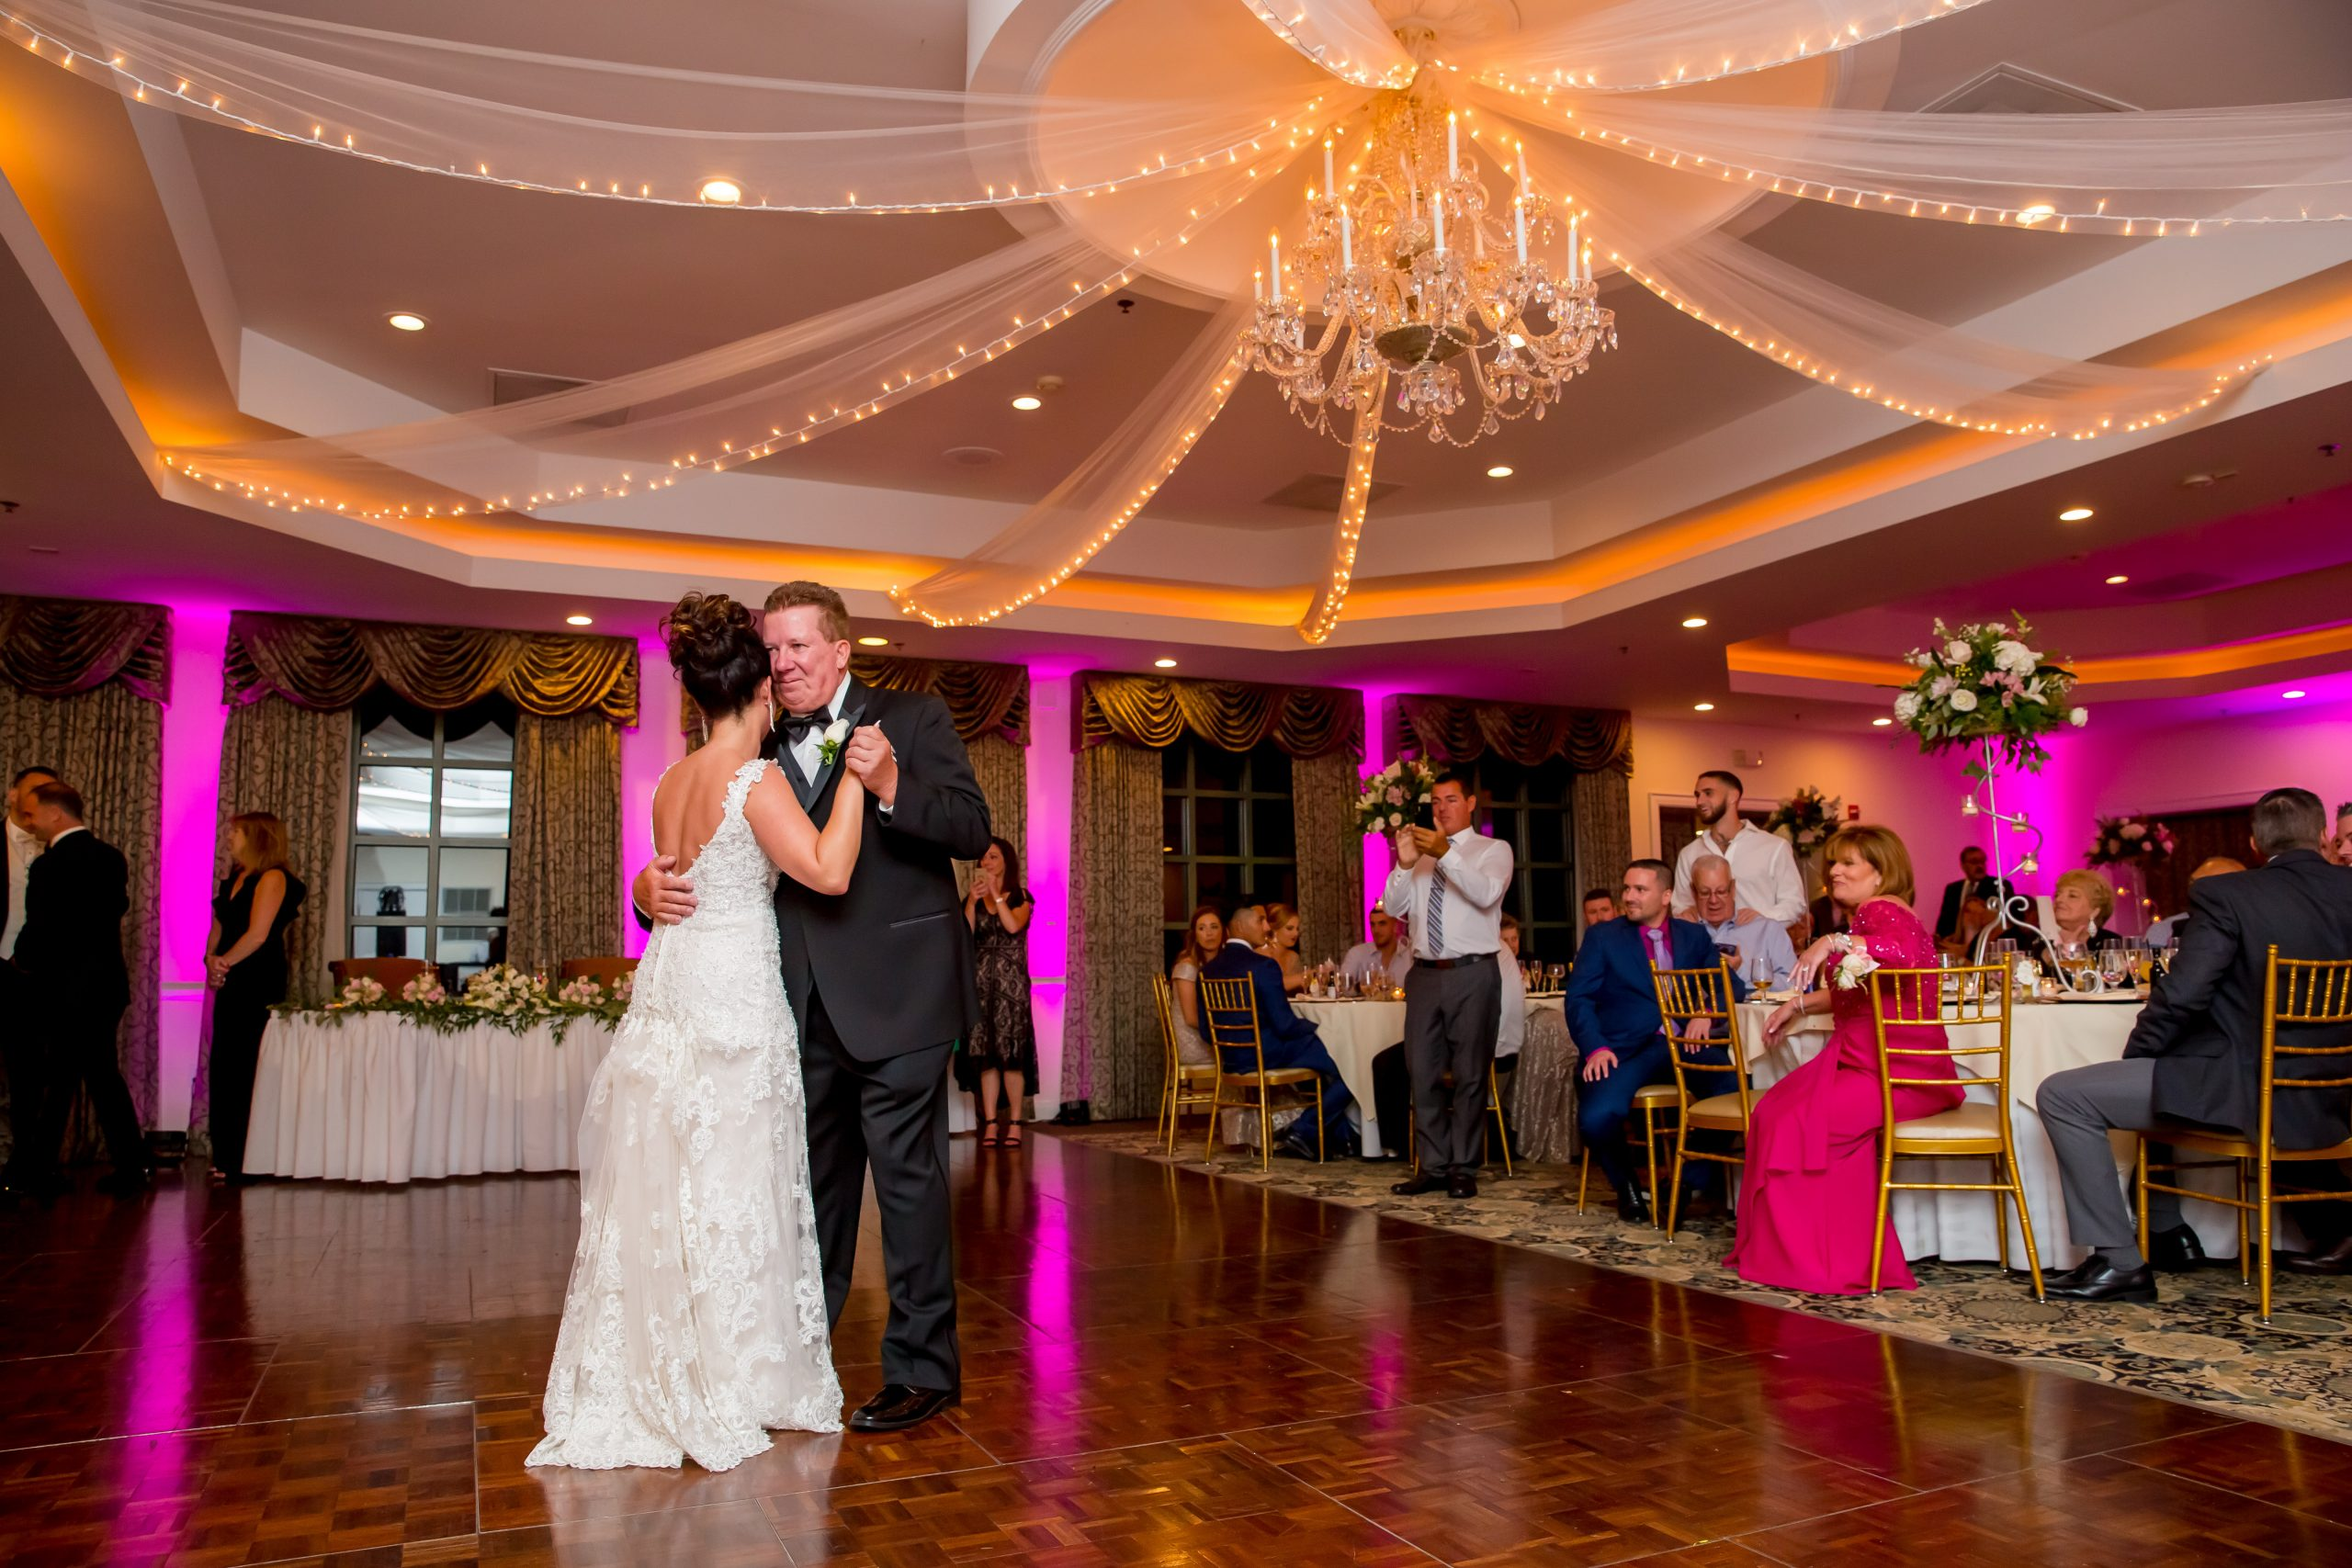 Victori_Rob_Mohawk River Country Club Wedding-53.jpg